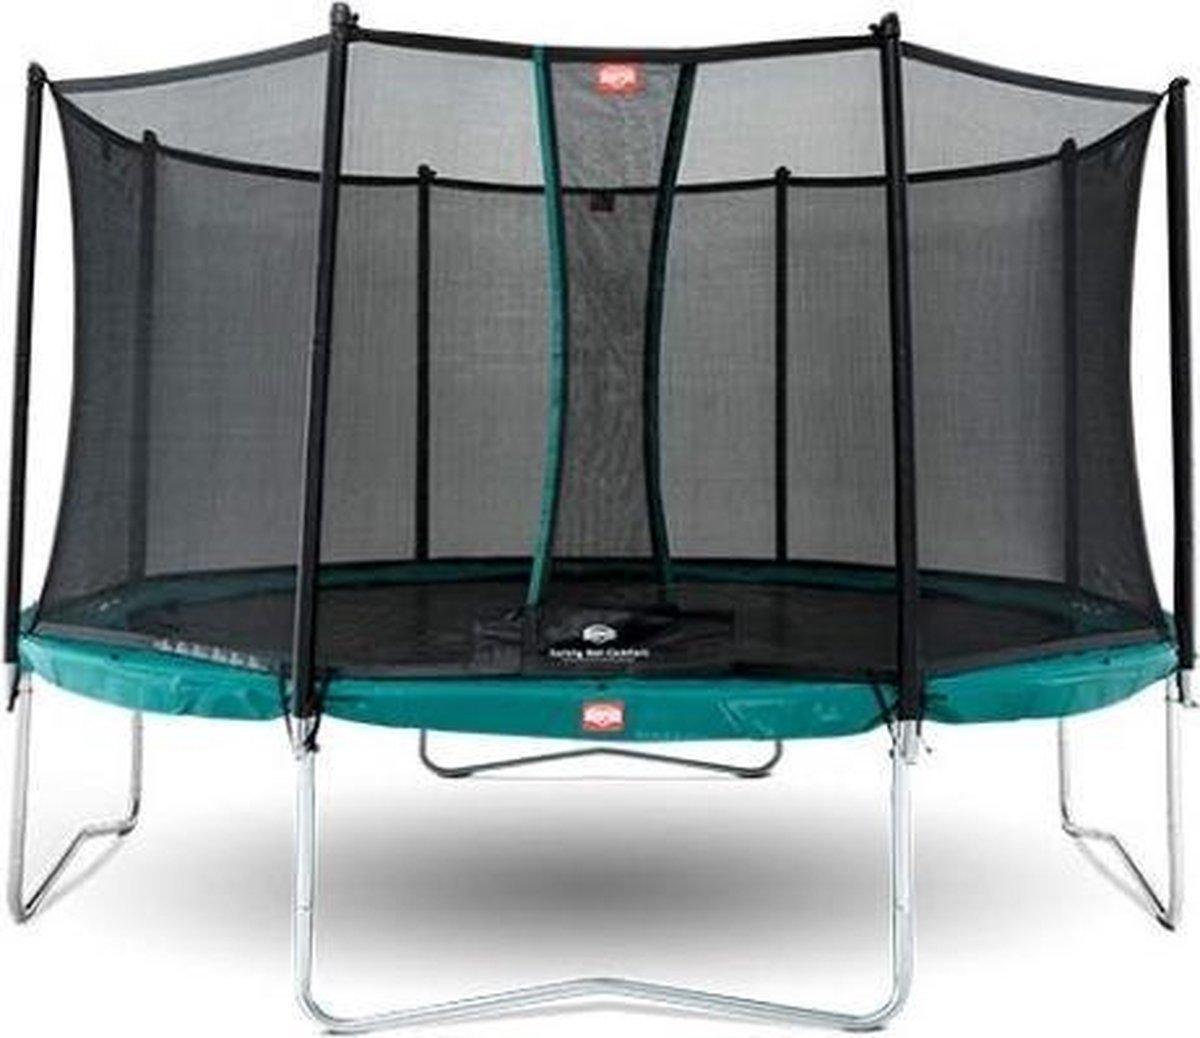 BERG Trampoline Favorit Regular Groen 380 cm rond + Safety Net Comfort